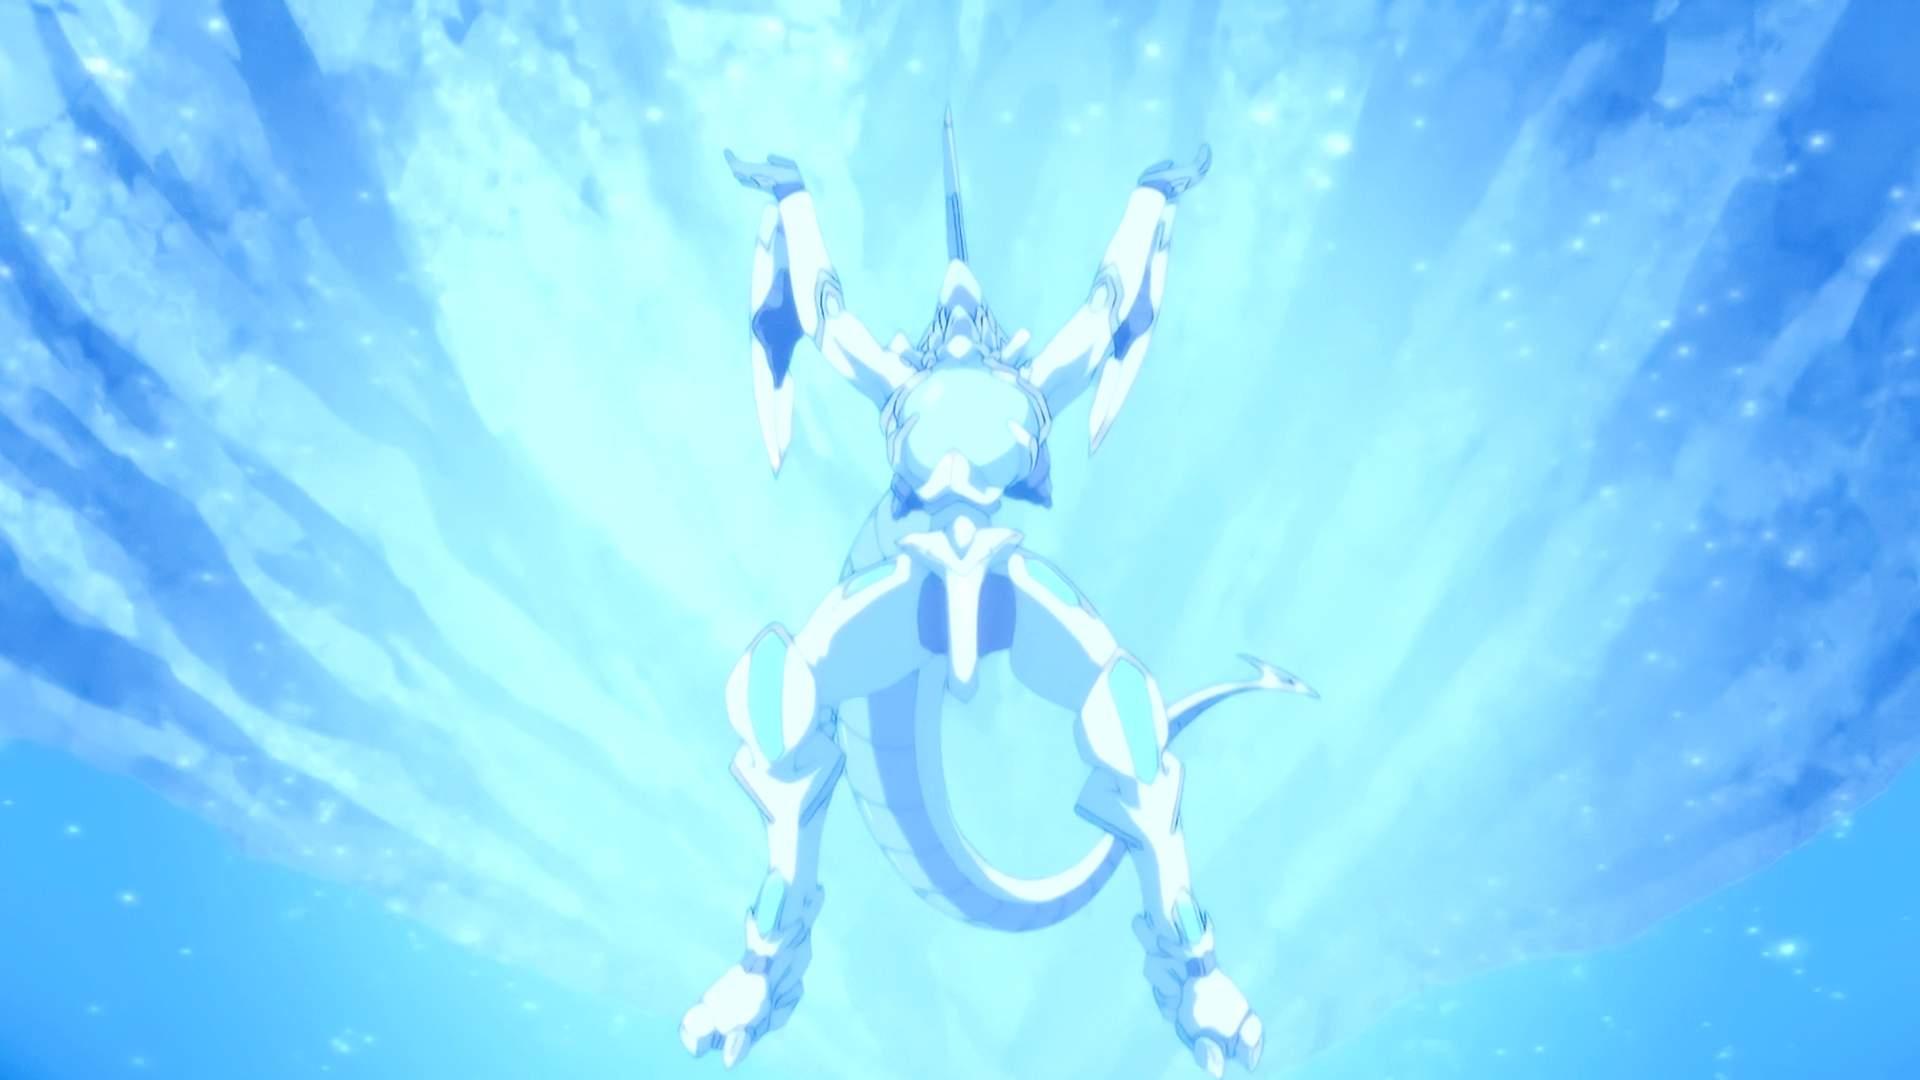 TenchiMuyoWaronGeminar-OVA1-SS6-O Tenchi Muyo! War on Geminar OVA Series Review